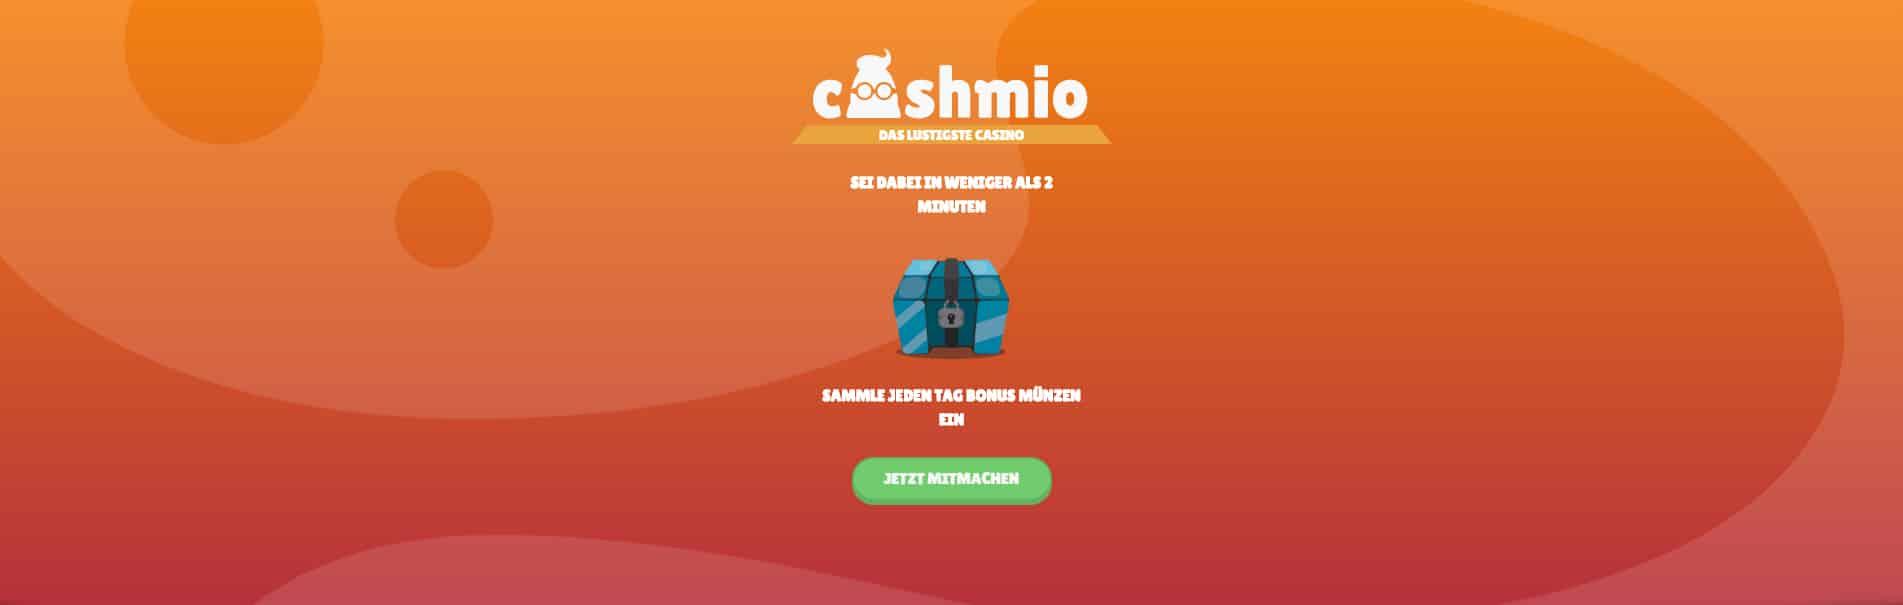 Cashmio Casino Content Images - Germany CasinoTop 01